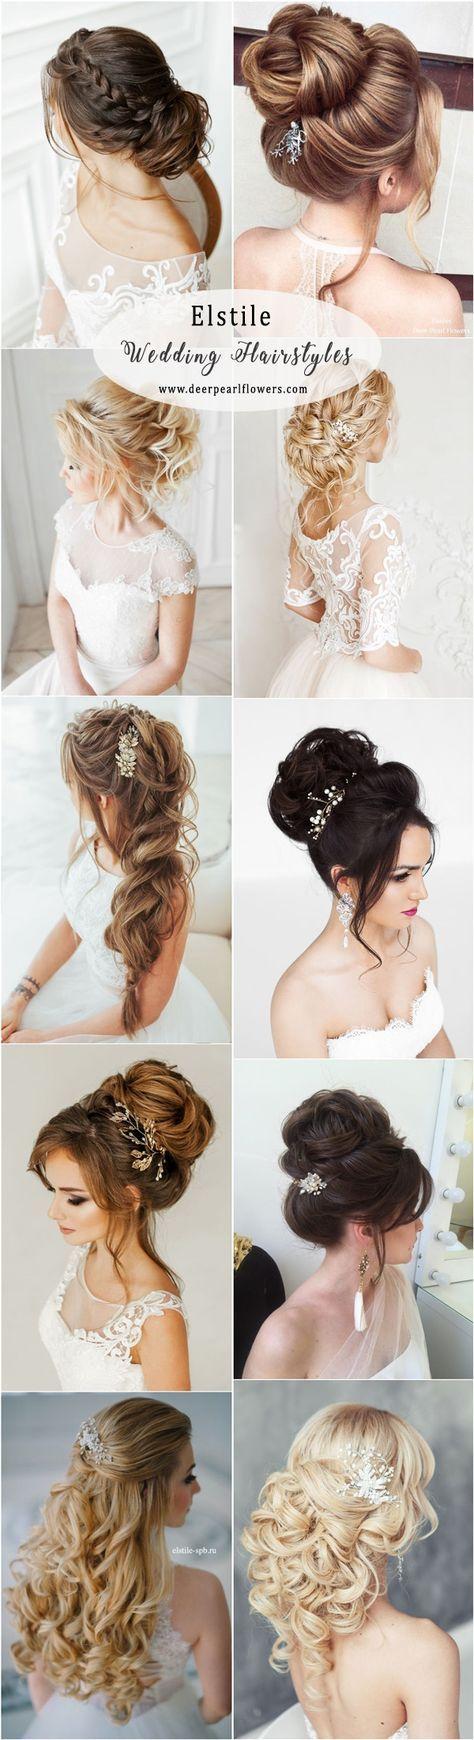 259 best Hair images on Pinterest | Bridal hairstyles, Hairdo ...